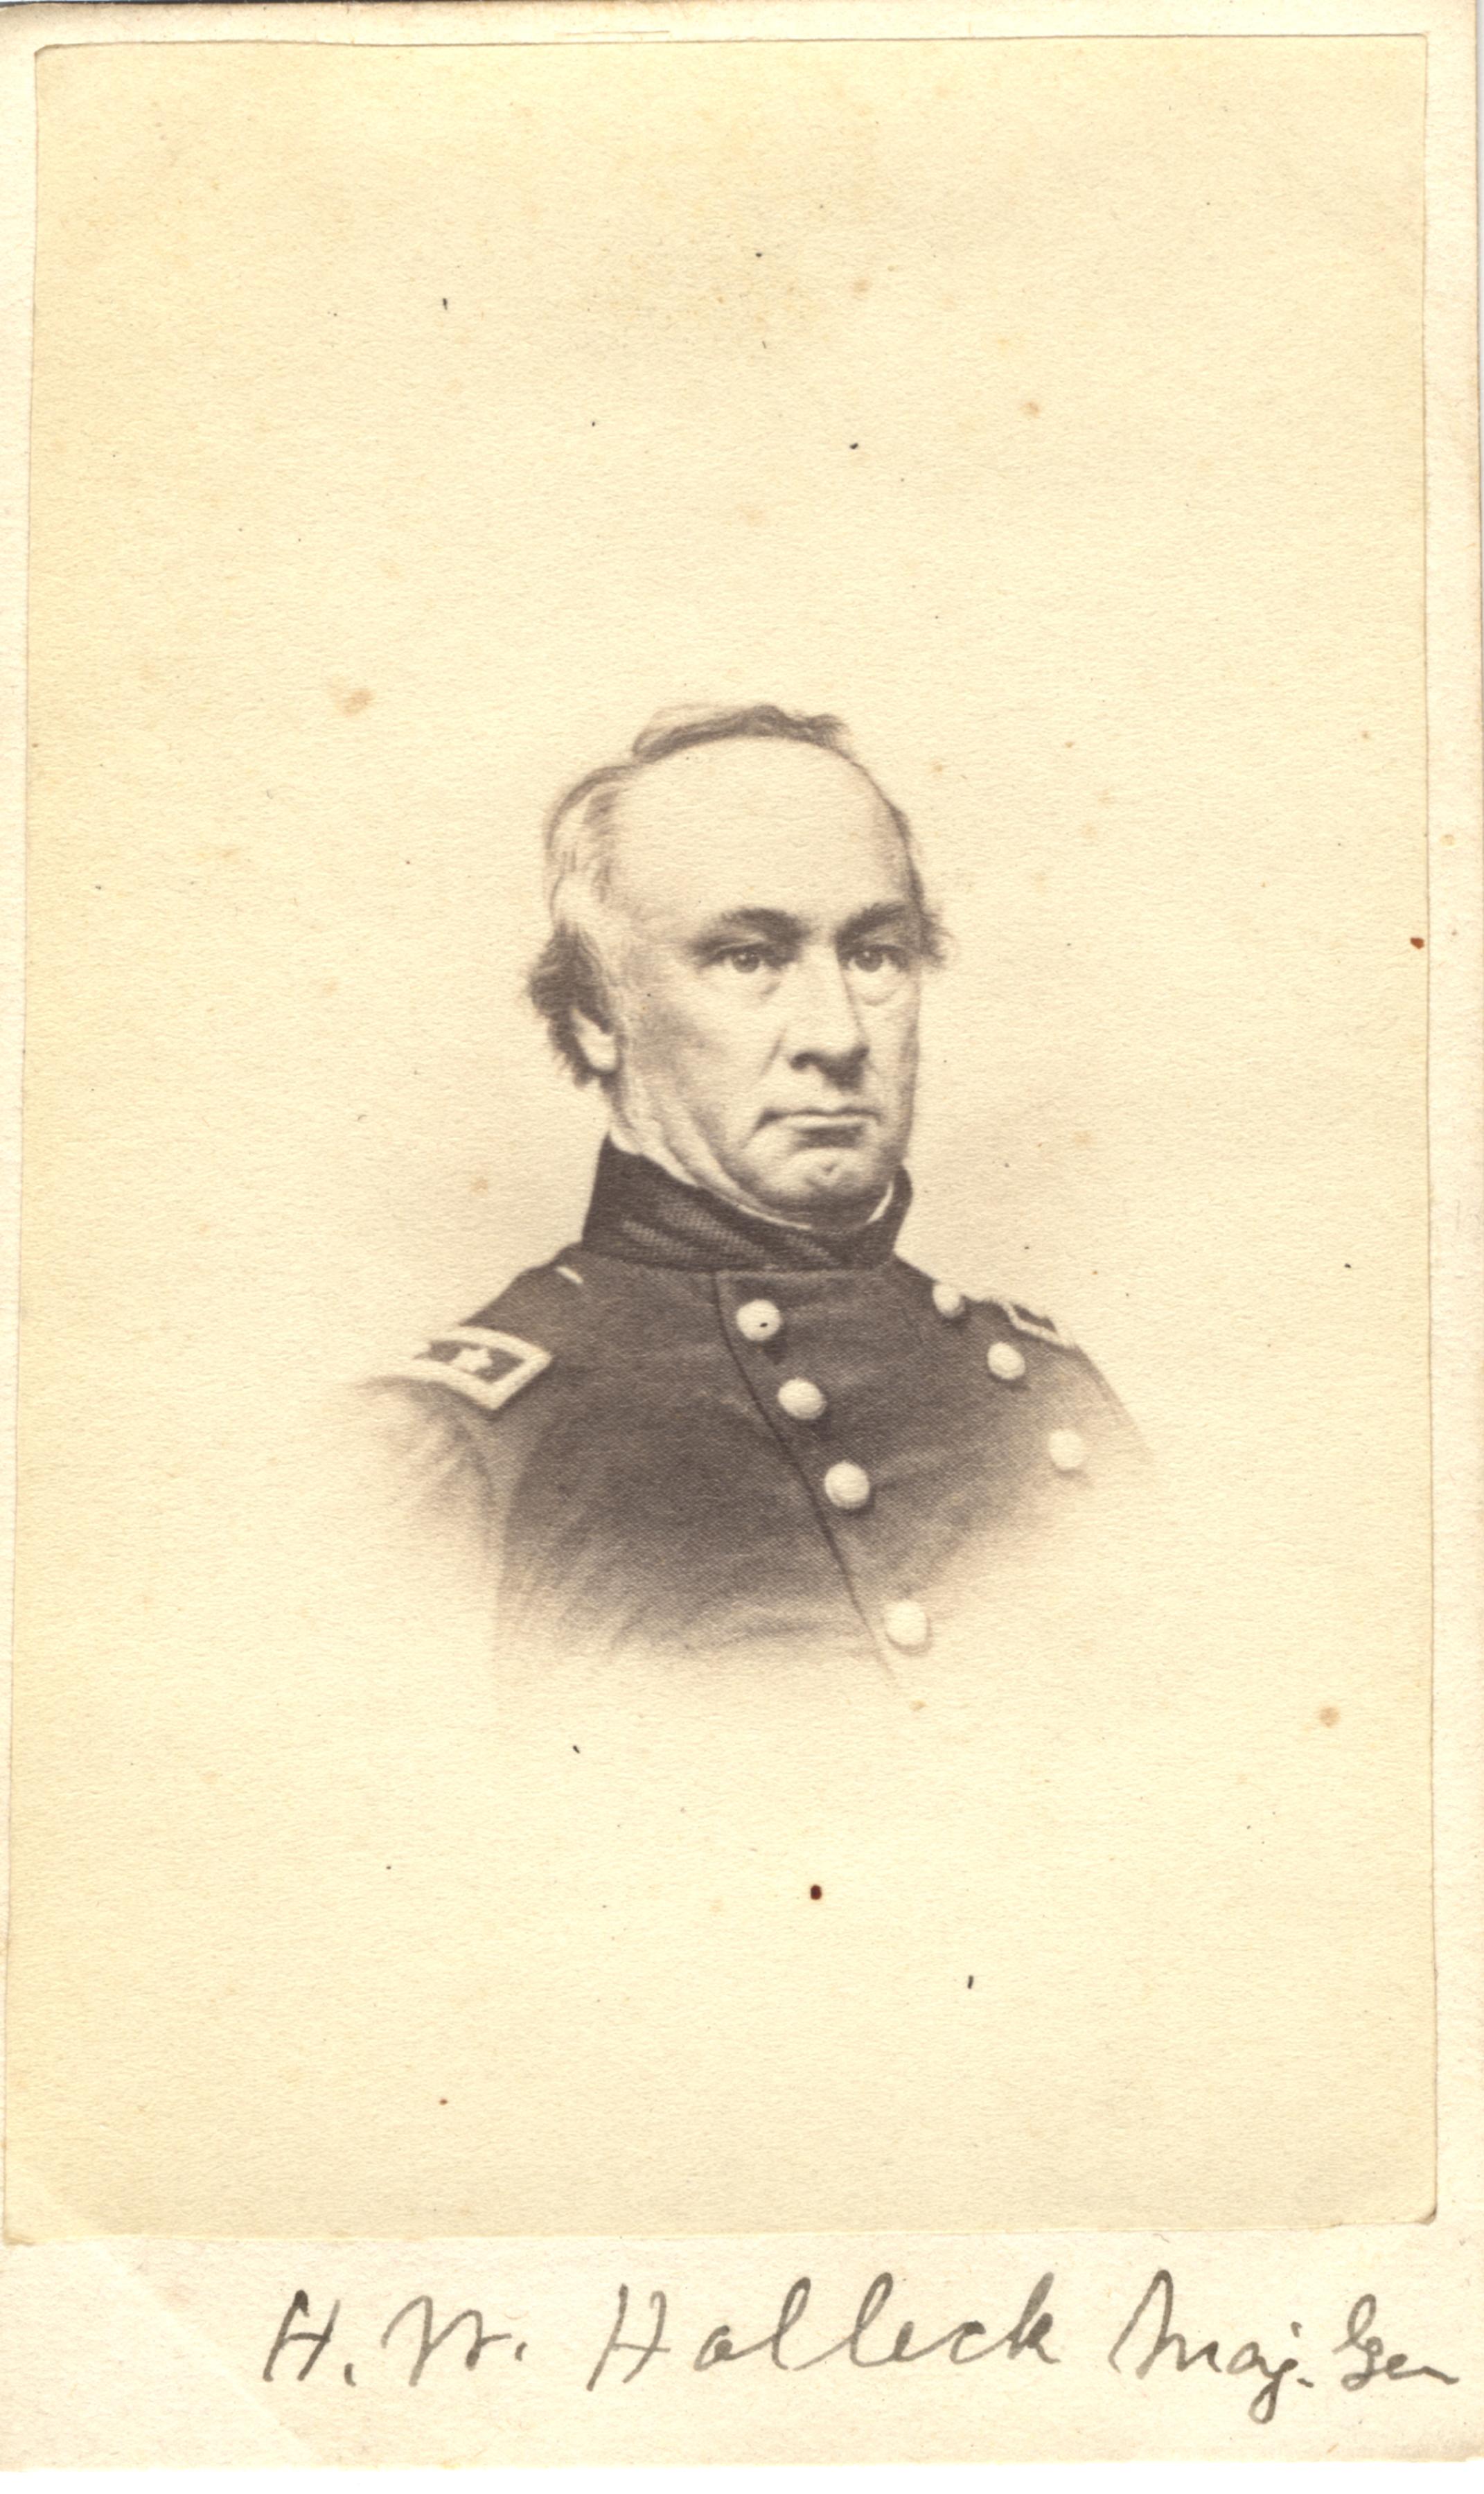 H. W. Halleck, circa 1860s